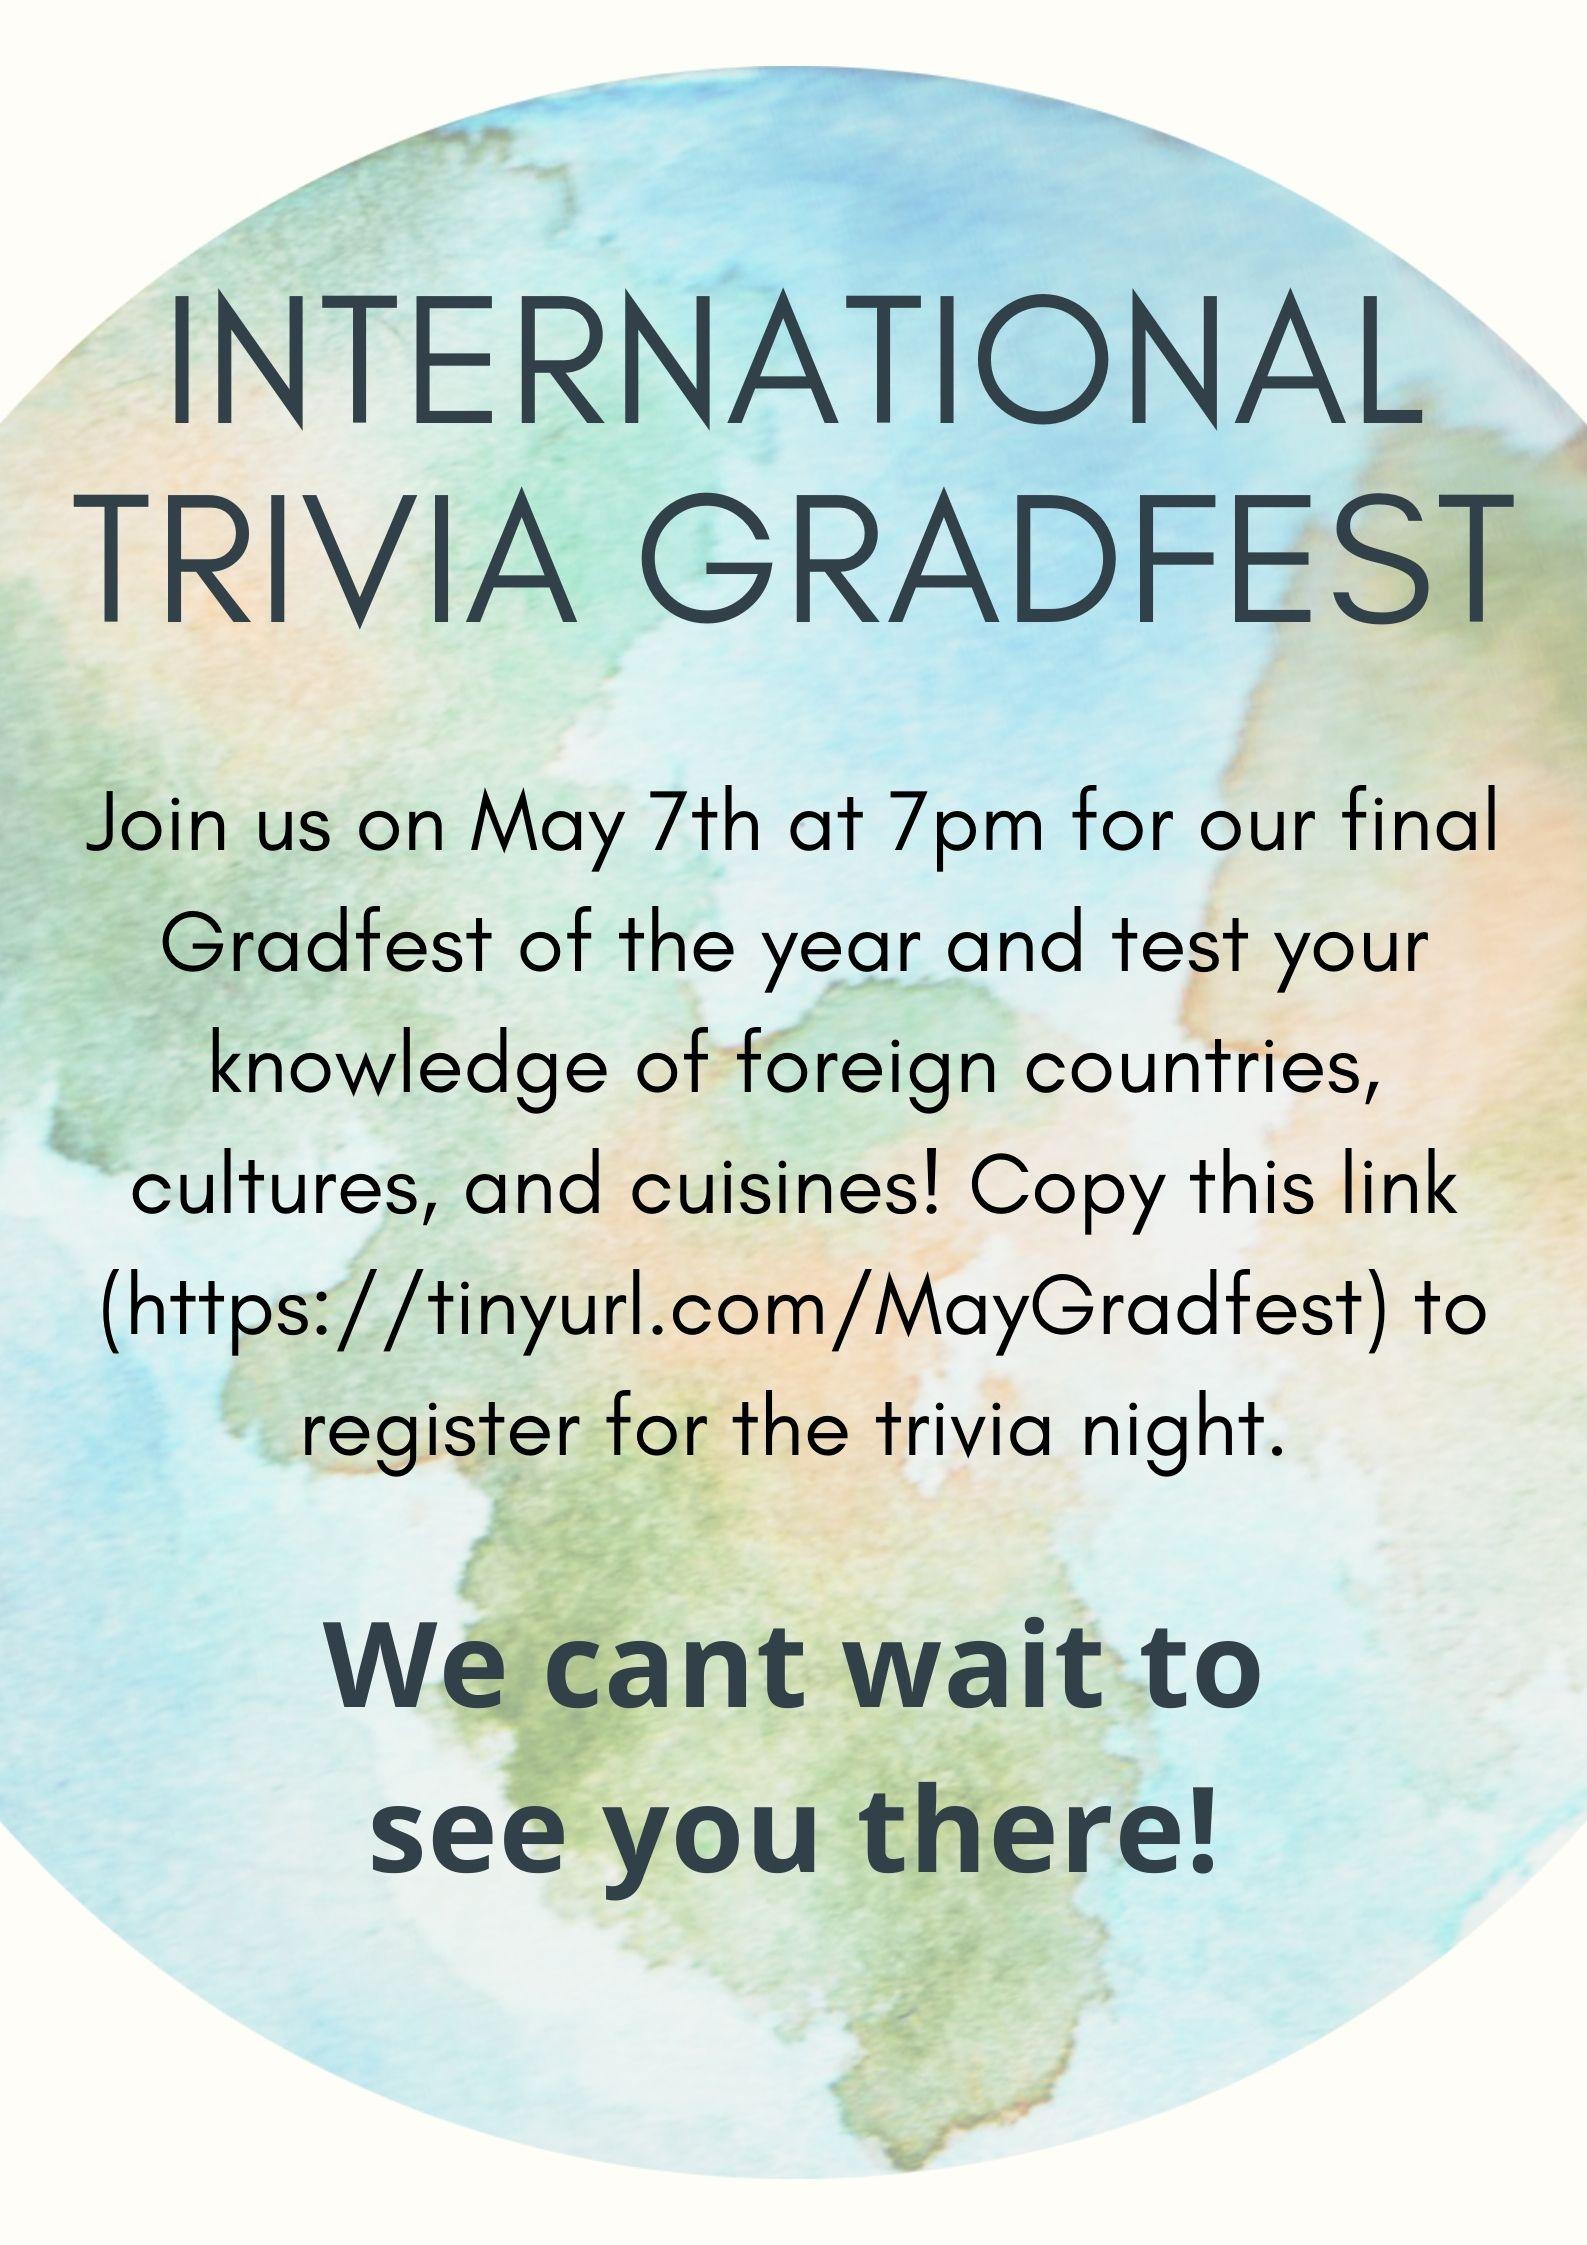 May GradFest